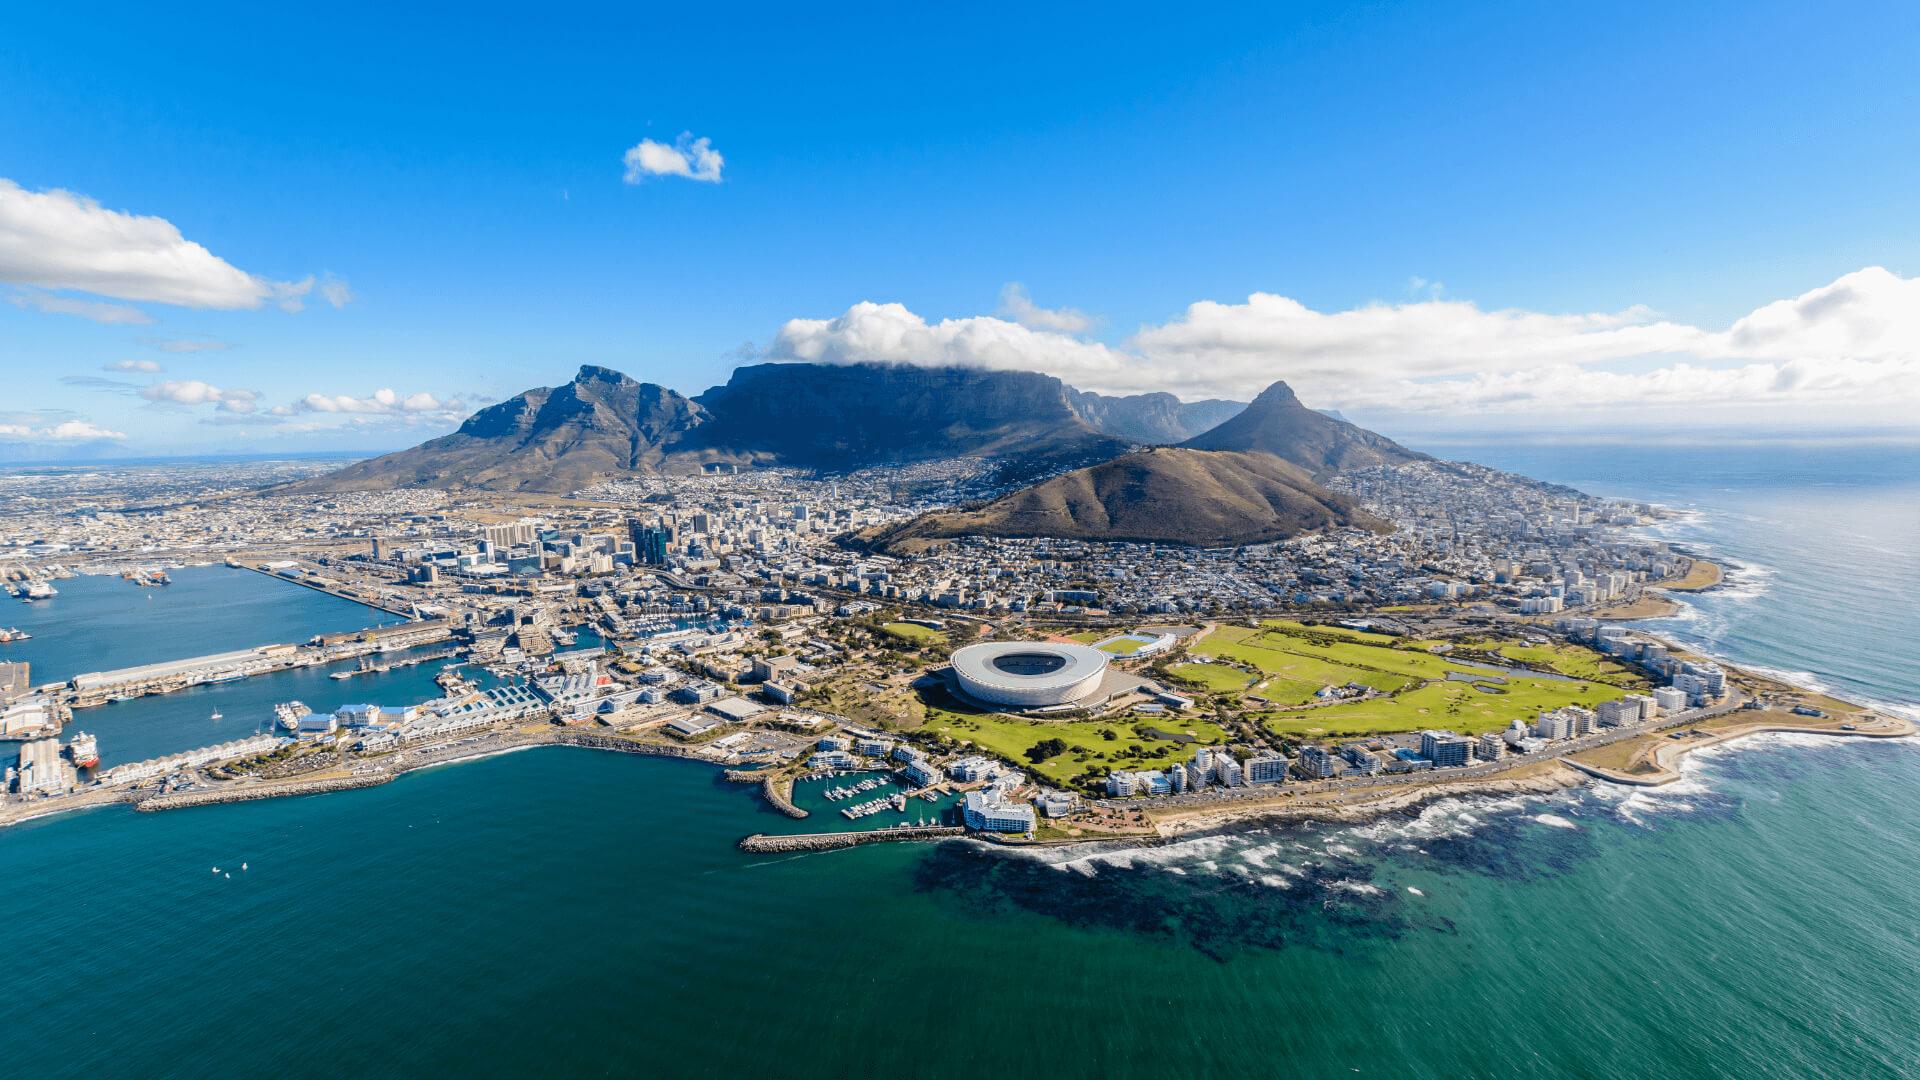 Modern Kent, Vahşi Doğa Yolculuk Cape Town'a